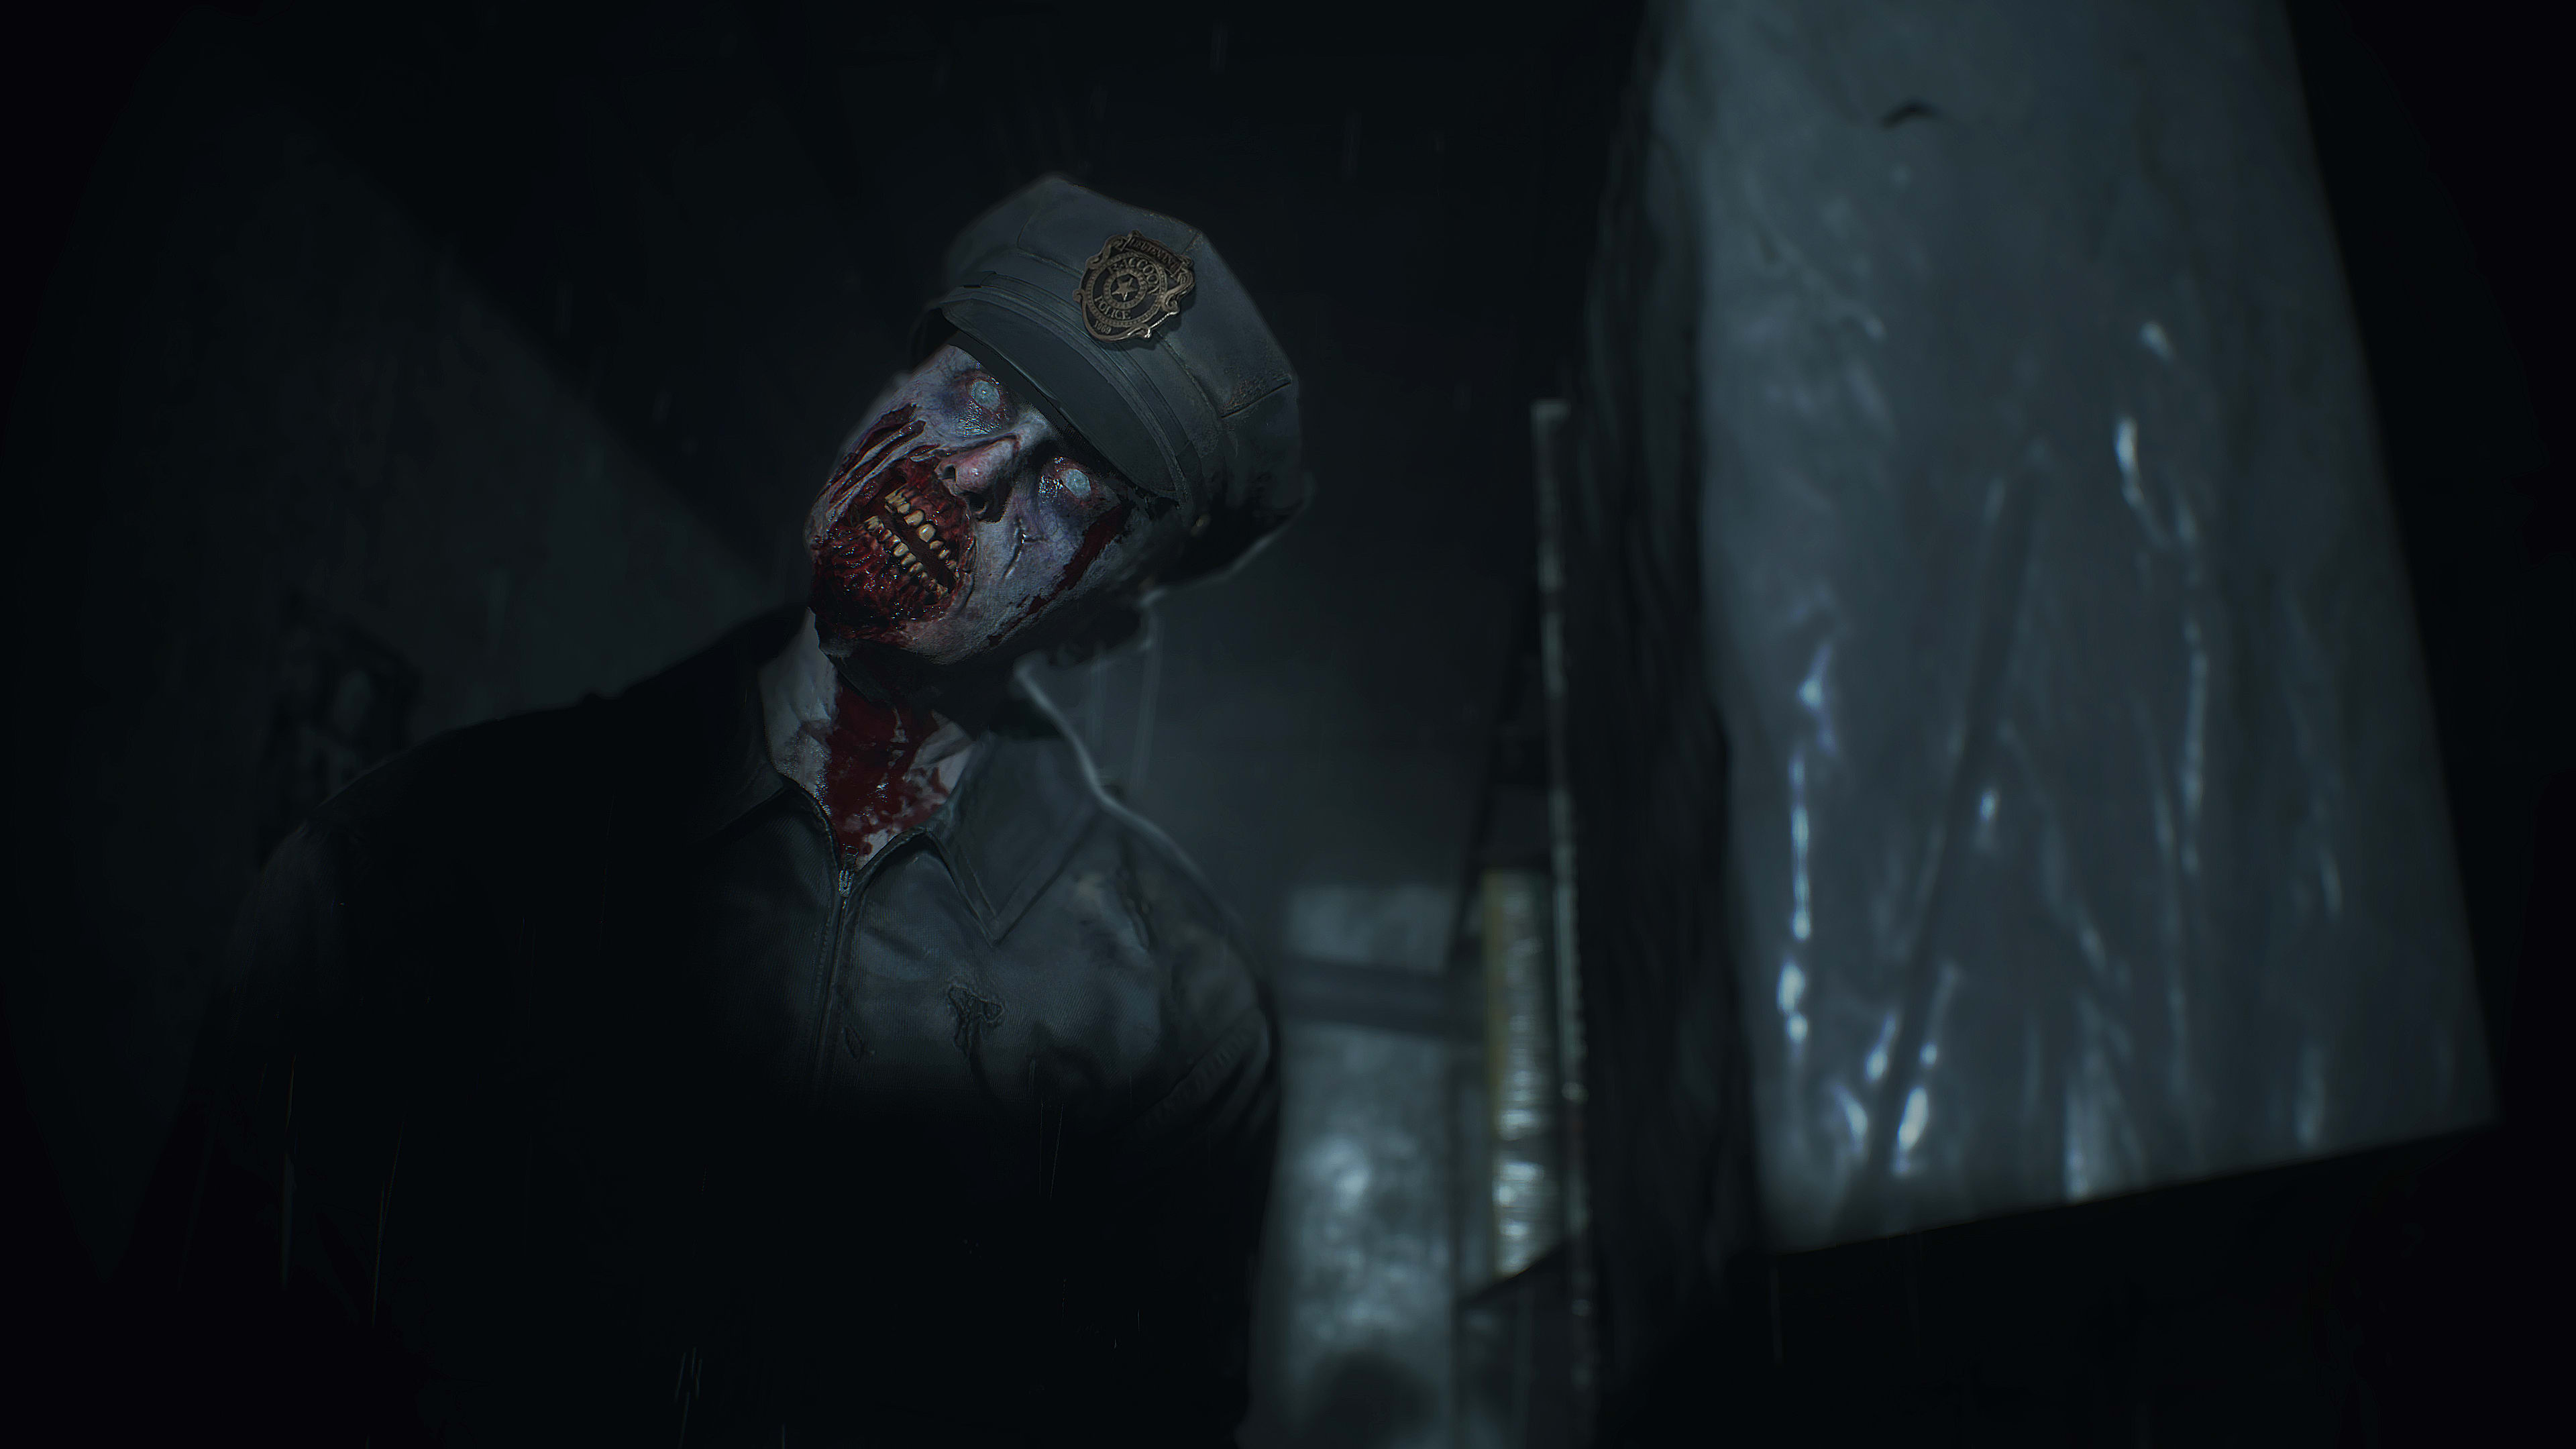 resident evil 2 remake collectors edition pre order uk